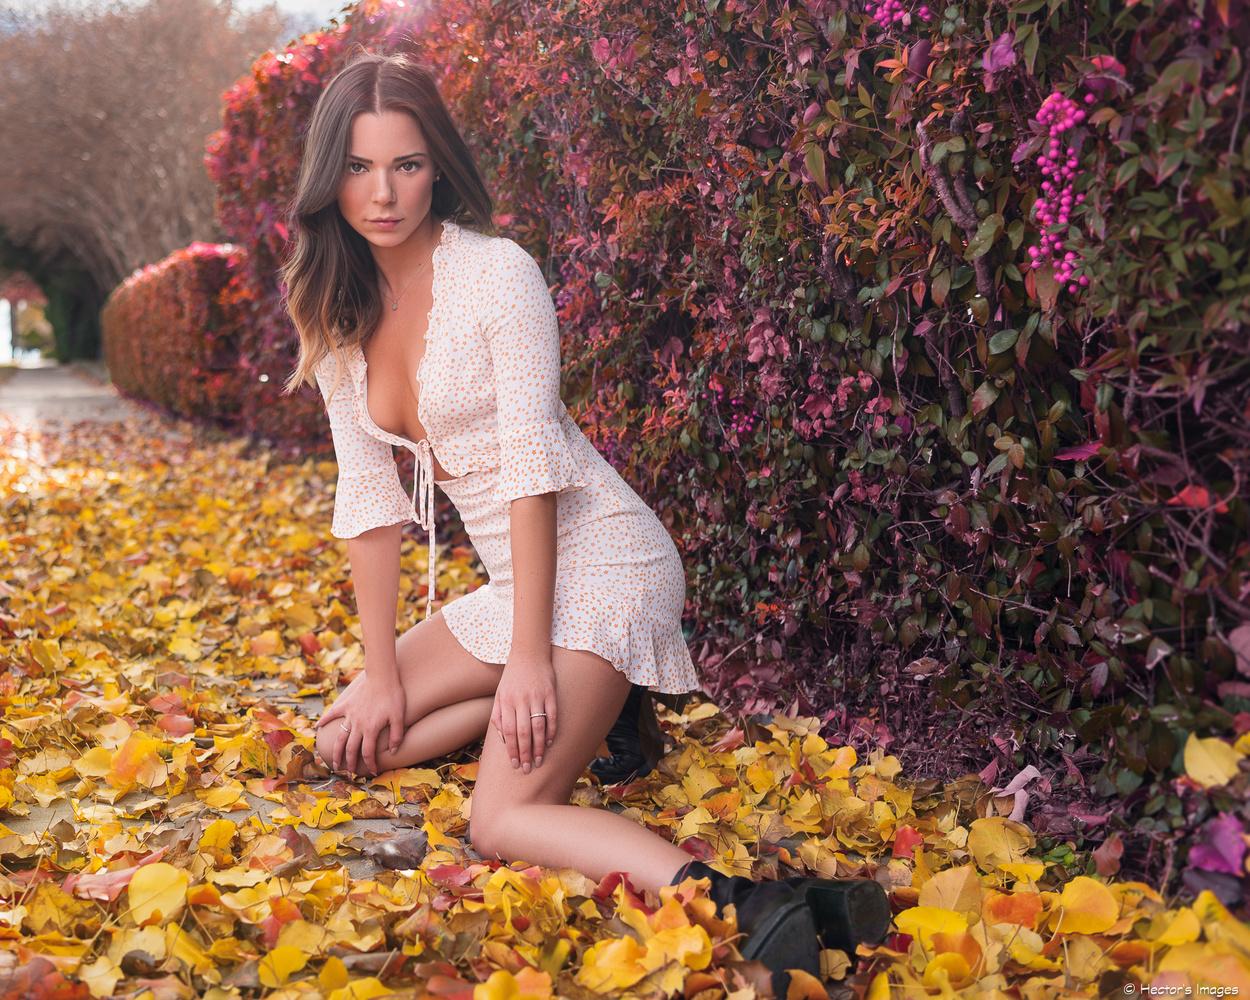 Alyssa's Fall Portrait by Hector Reyes